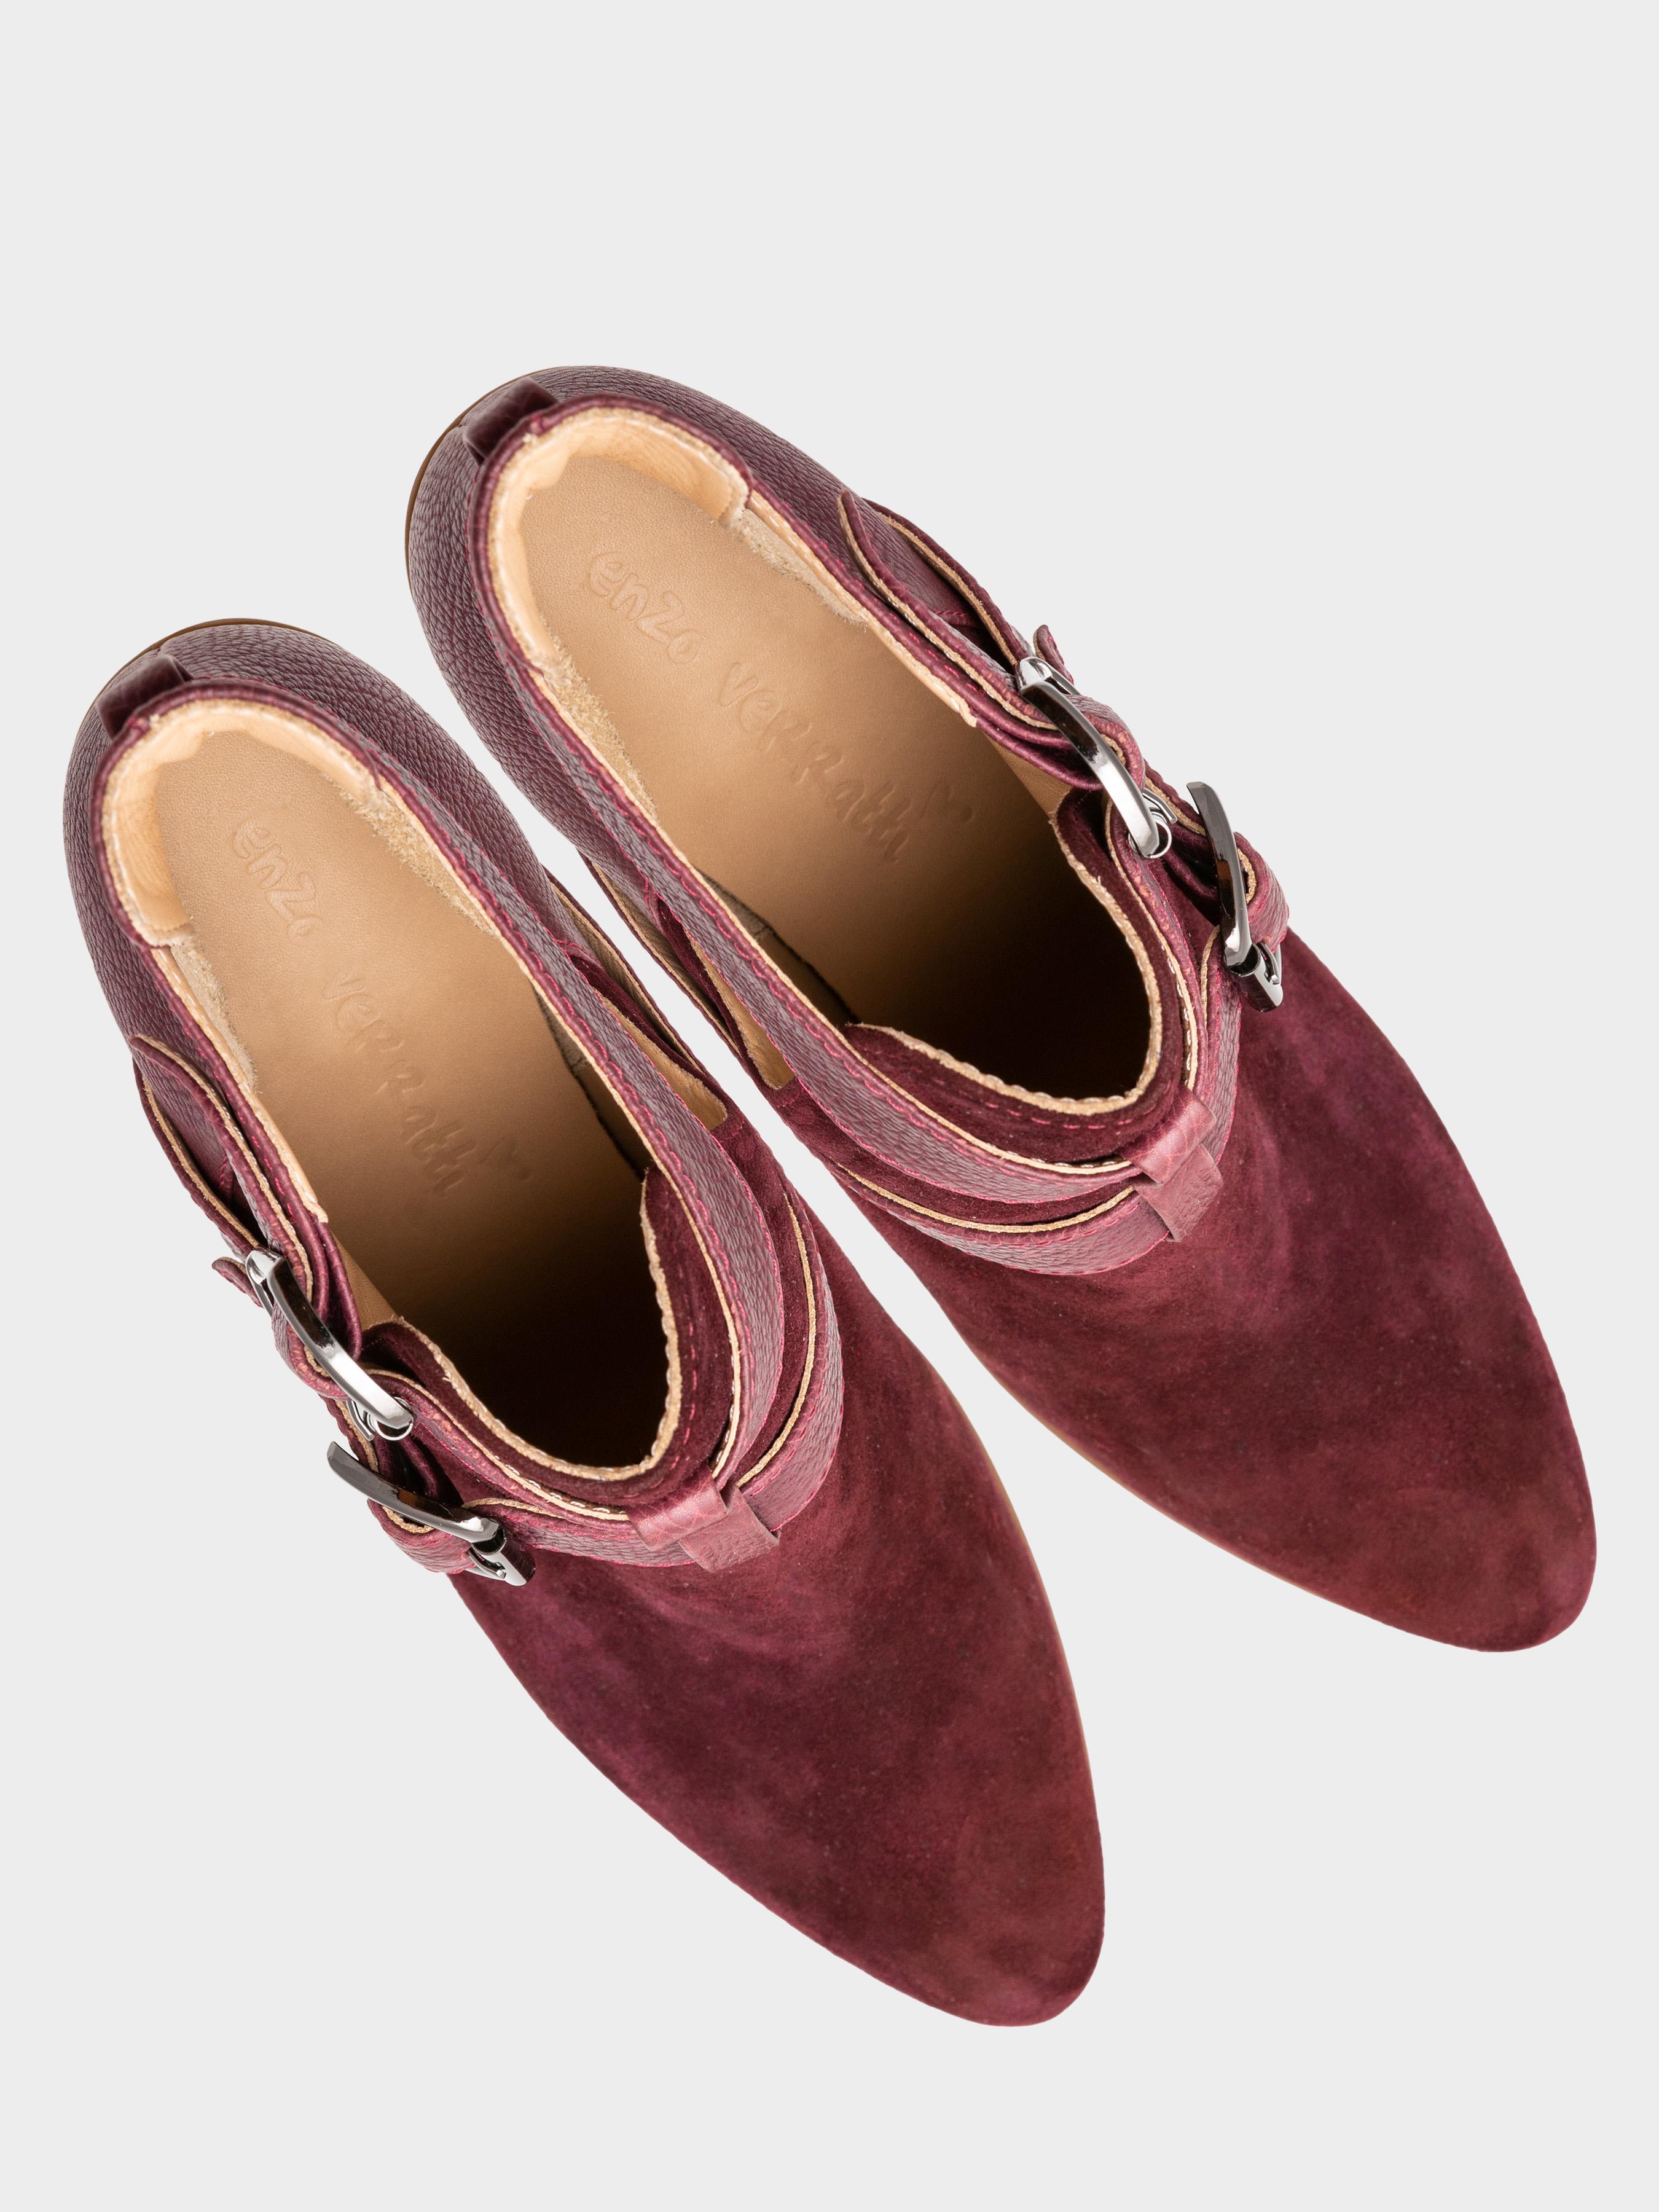 Ботинки для женщин Ботинки женские ENZO VERRATTI 18-18-9695ch цена, 2017